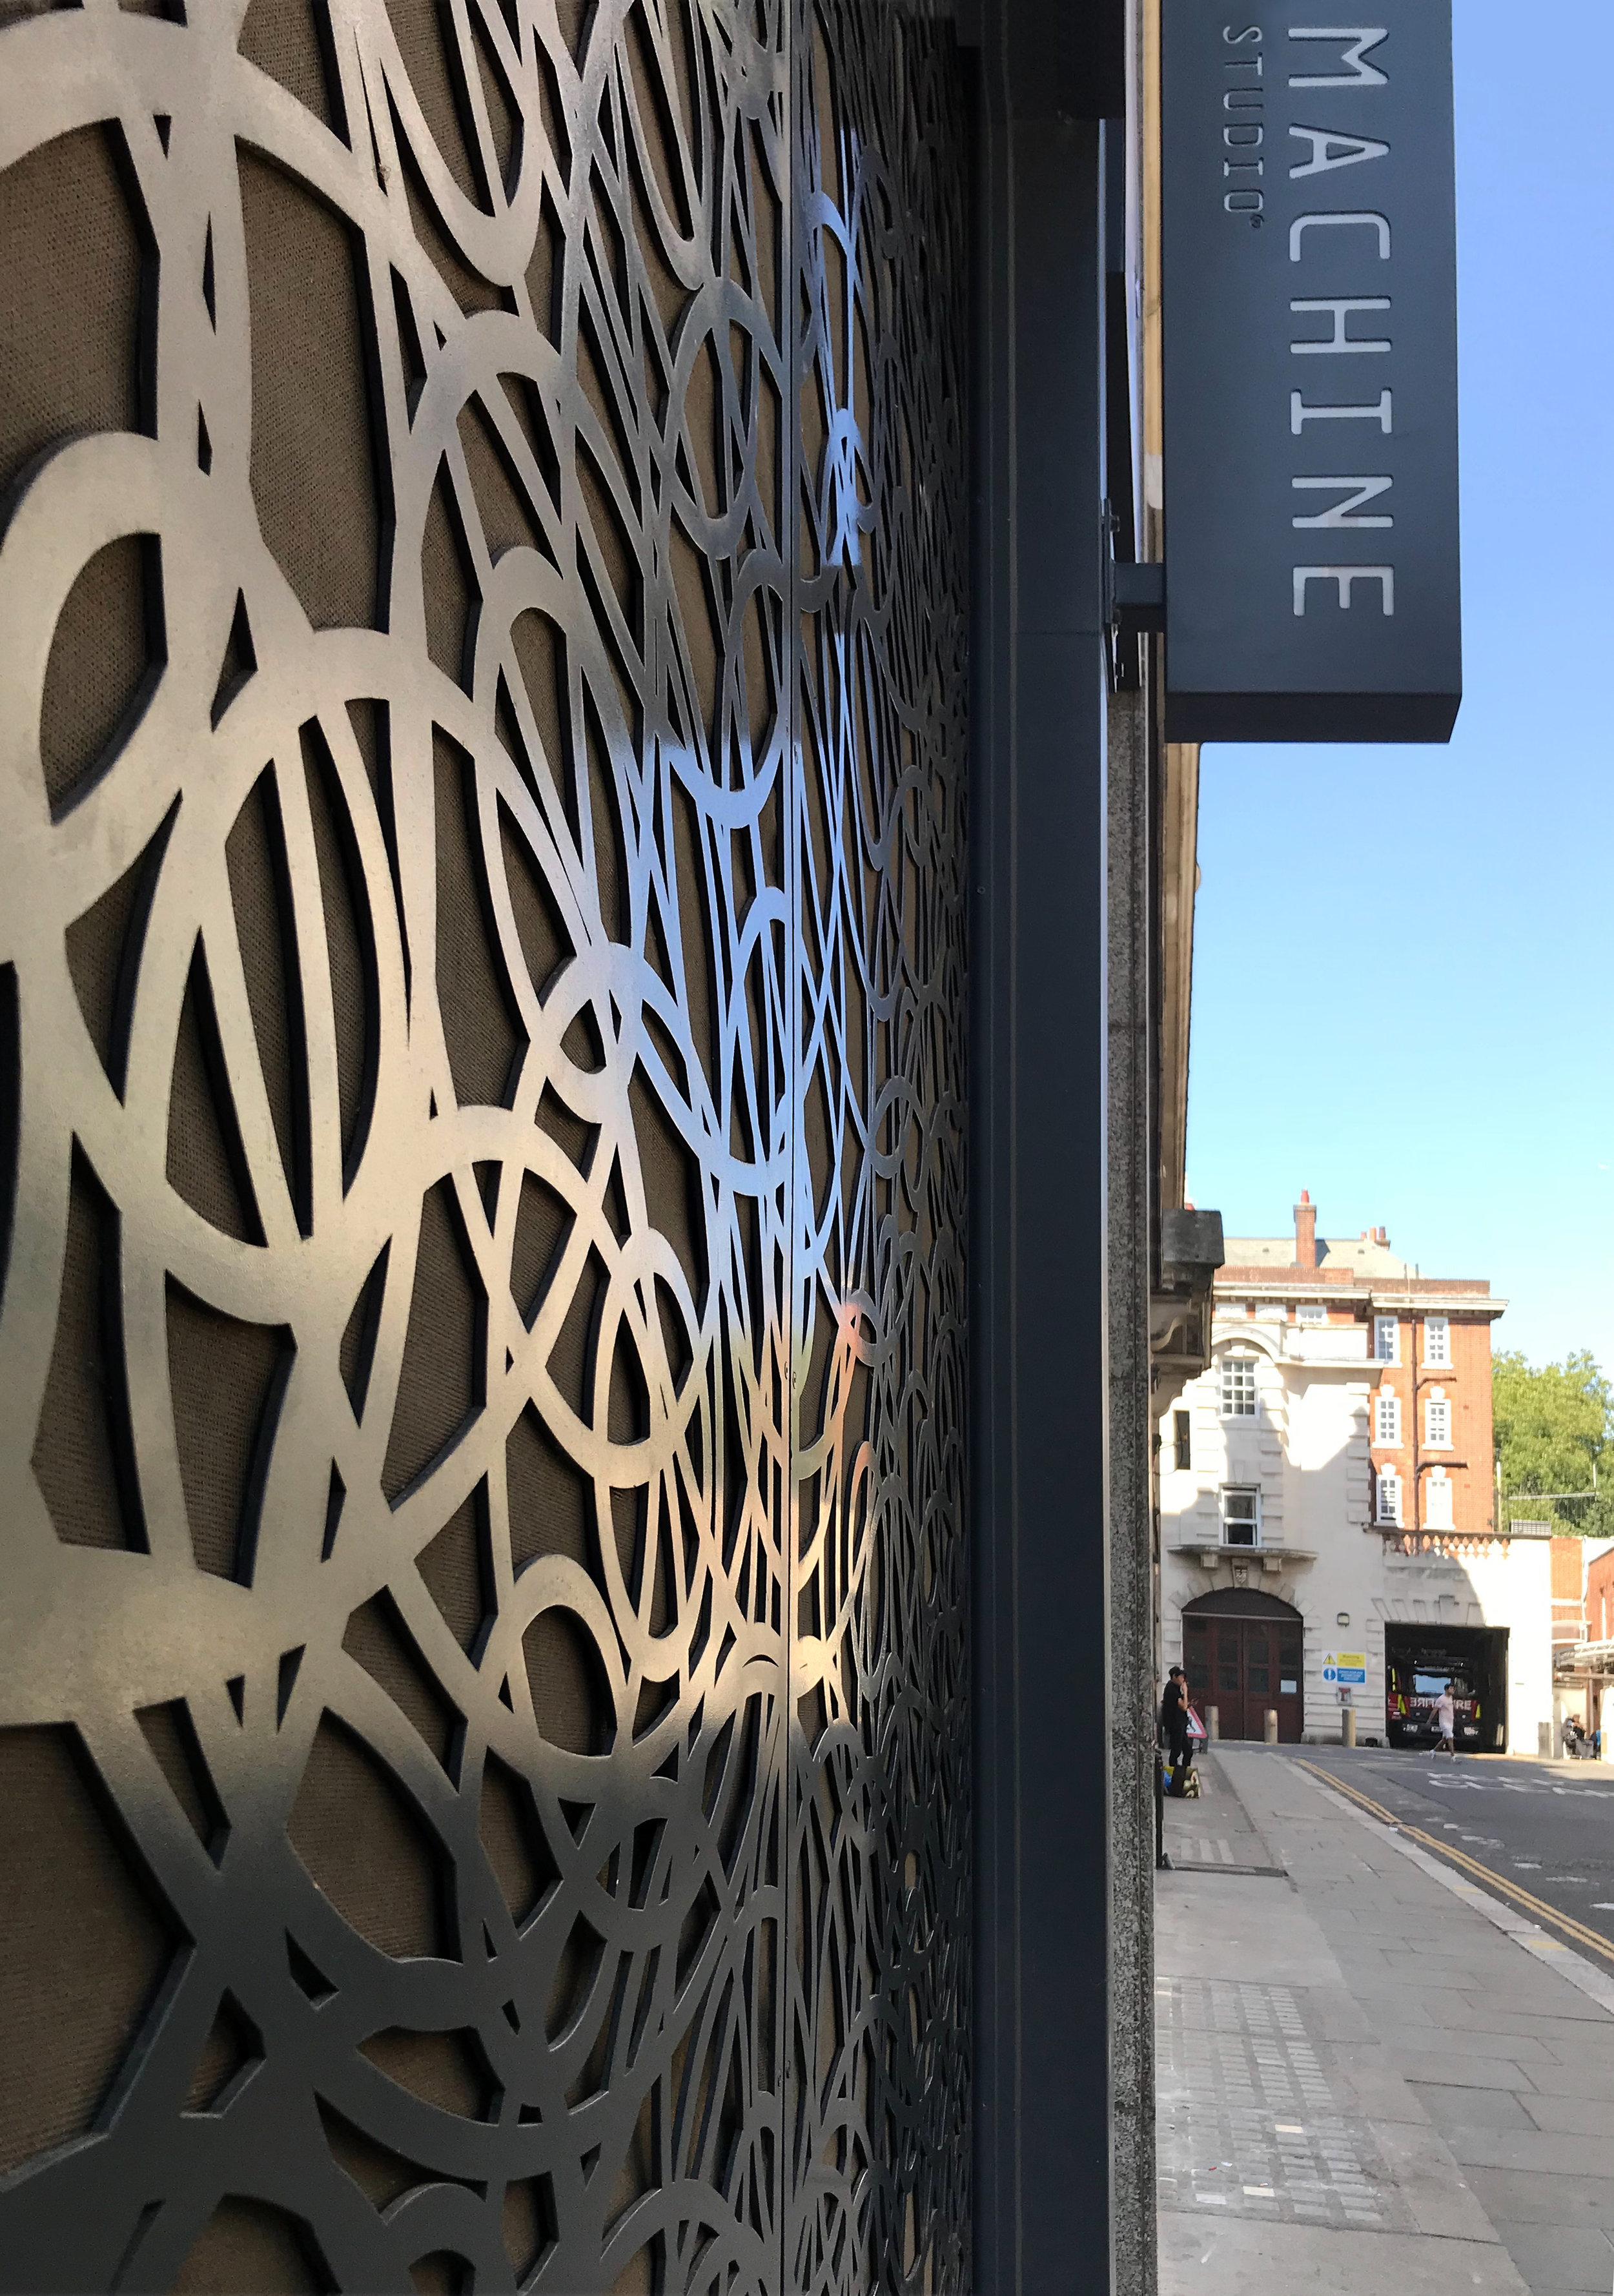 Helix Architecture_High Street Kensington_2017_01.jpg